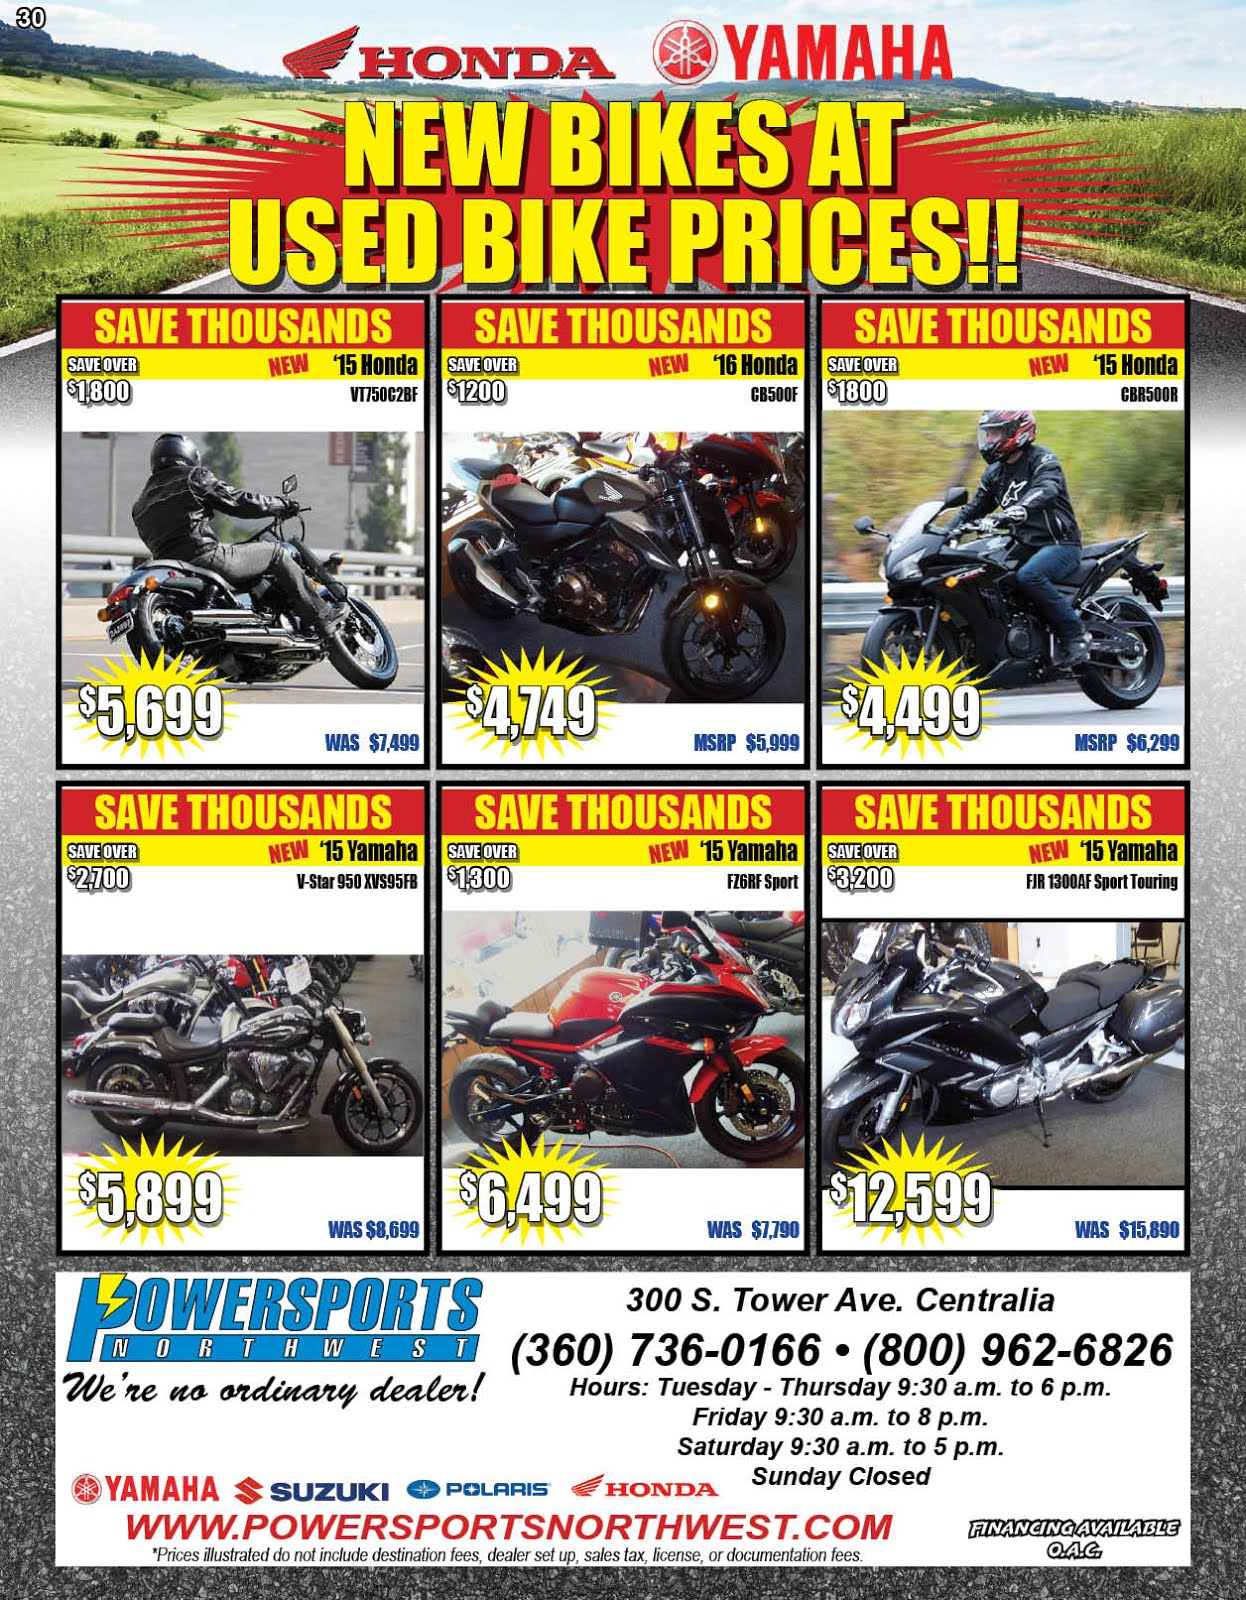 Powersports Northwest New Bikes @ Used Bike Prices!!